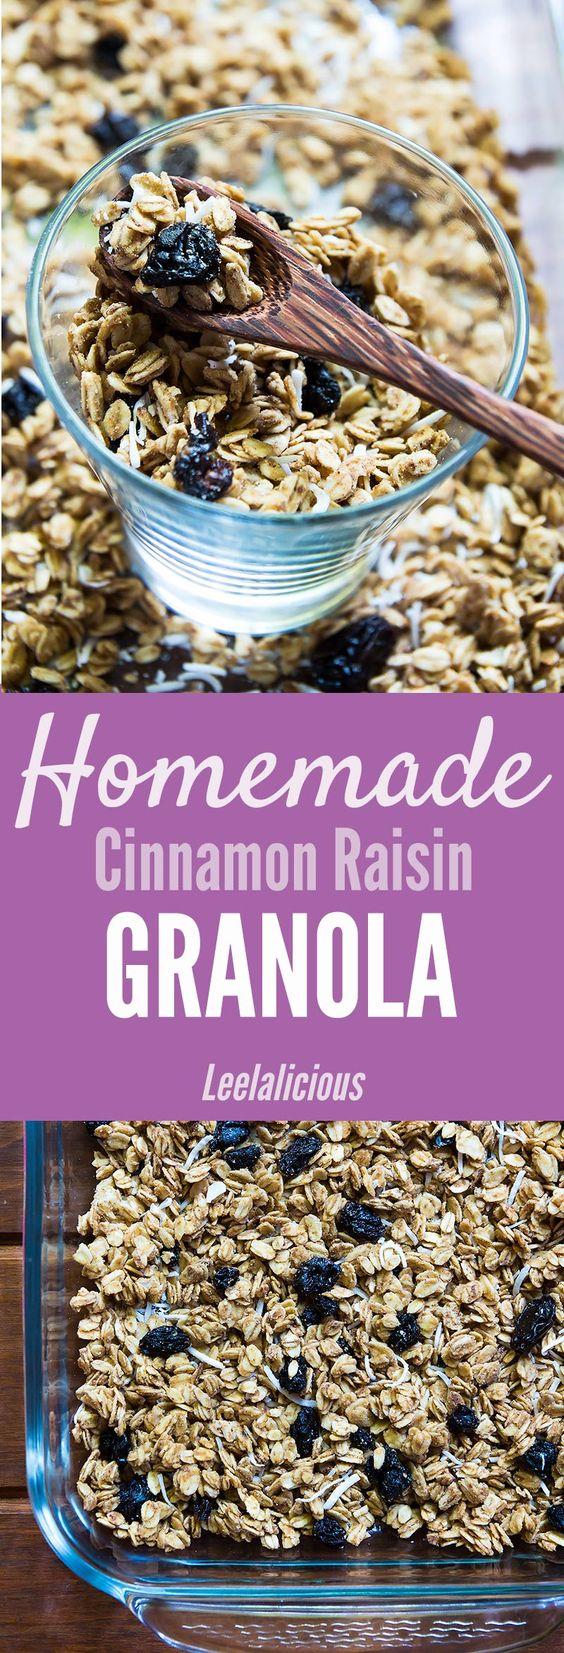 Homemade Cinnamon Raisin Granola | Eating Vegan, Granola and Gluten ...